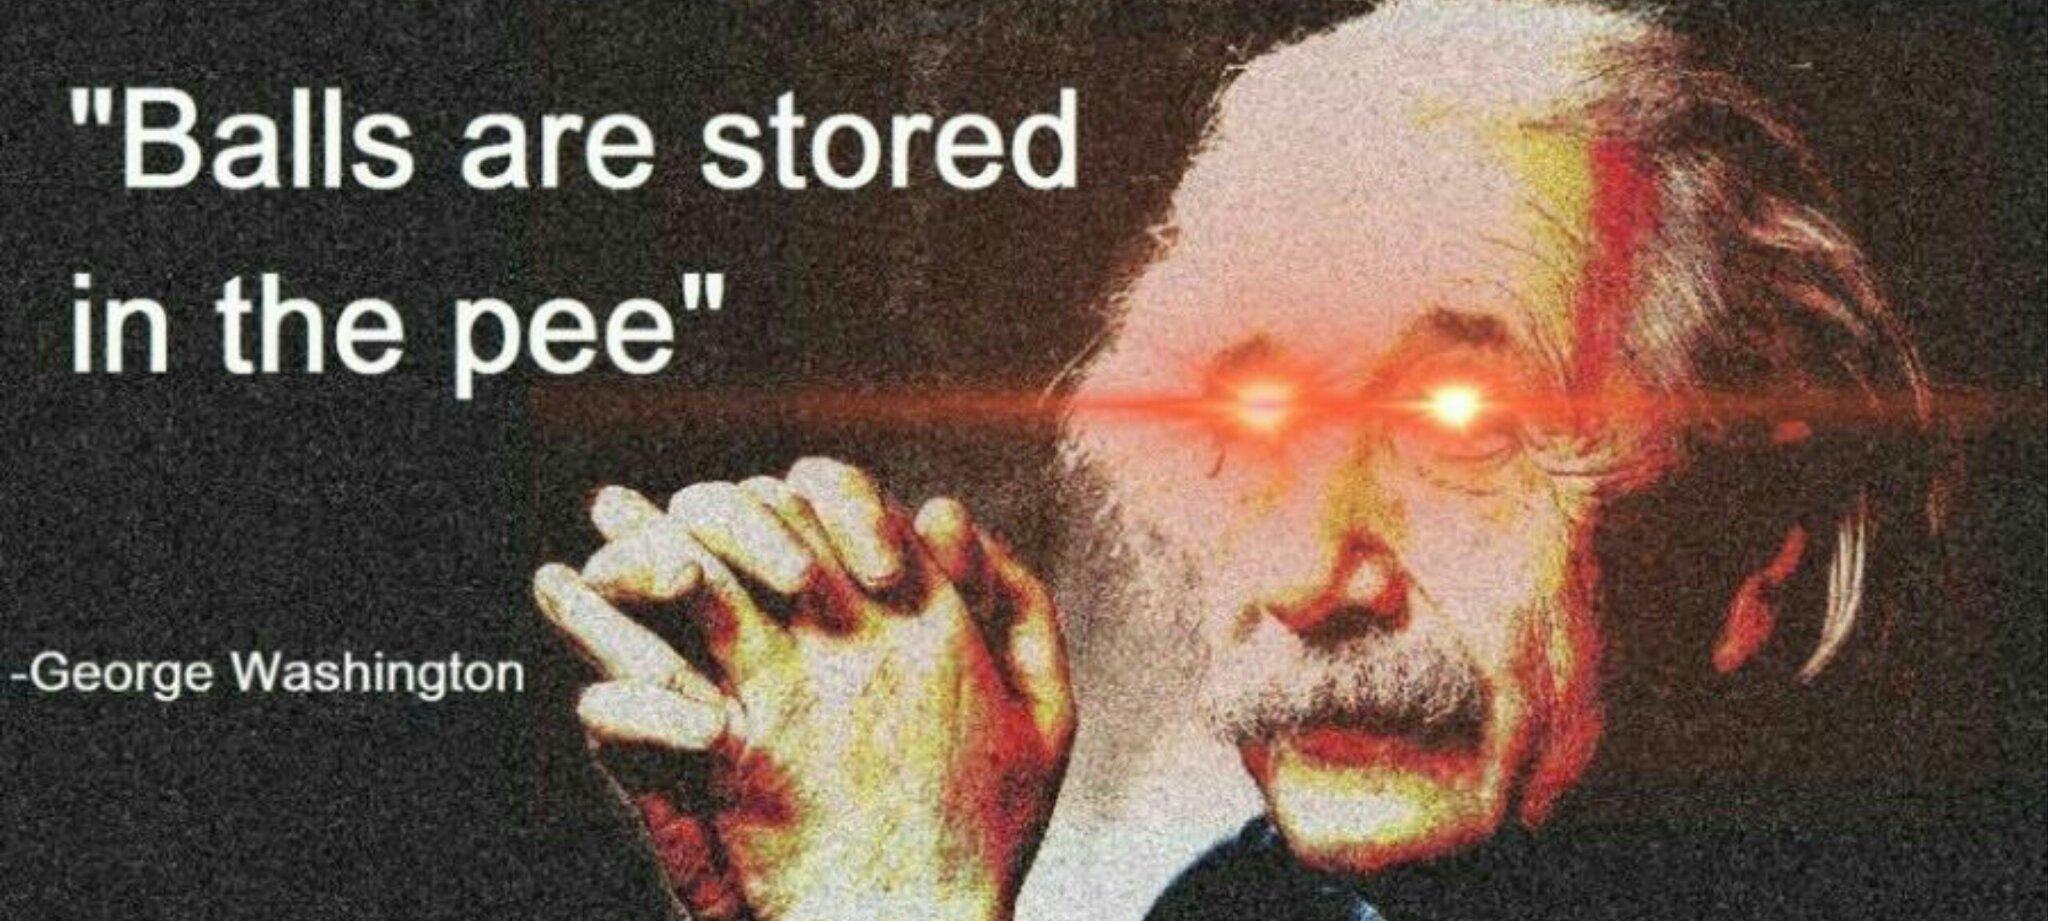 Agreed - meme